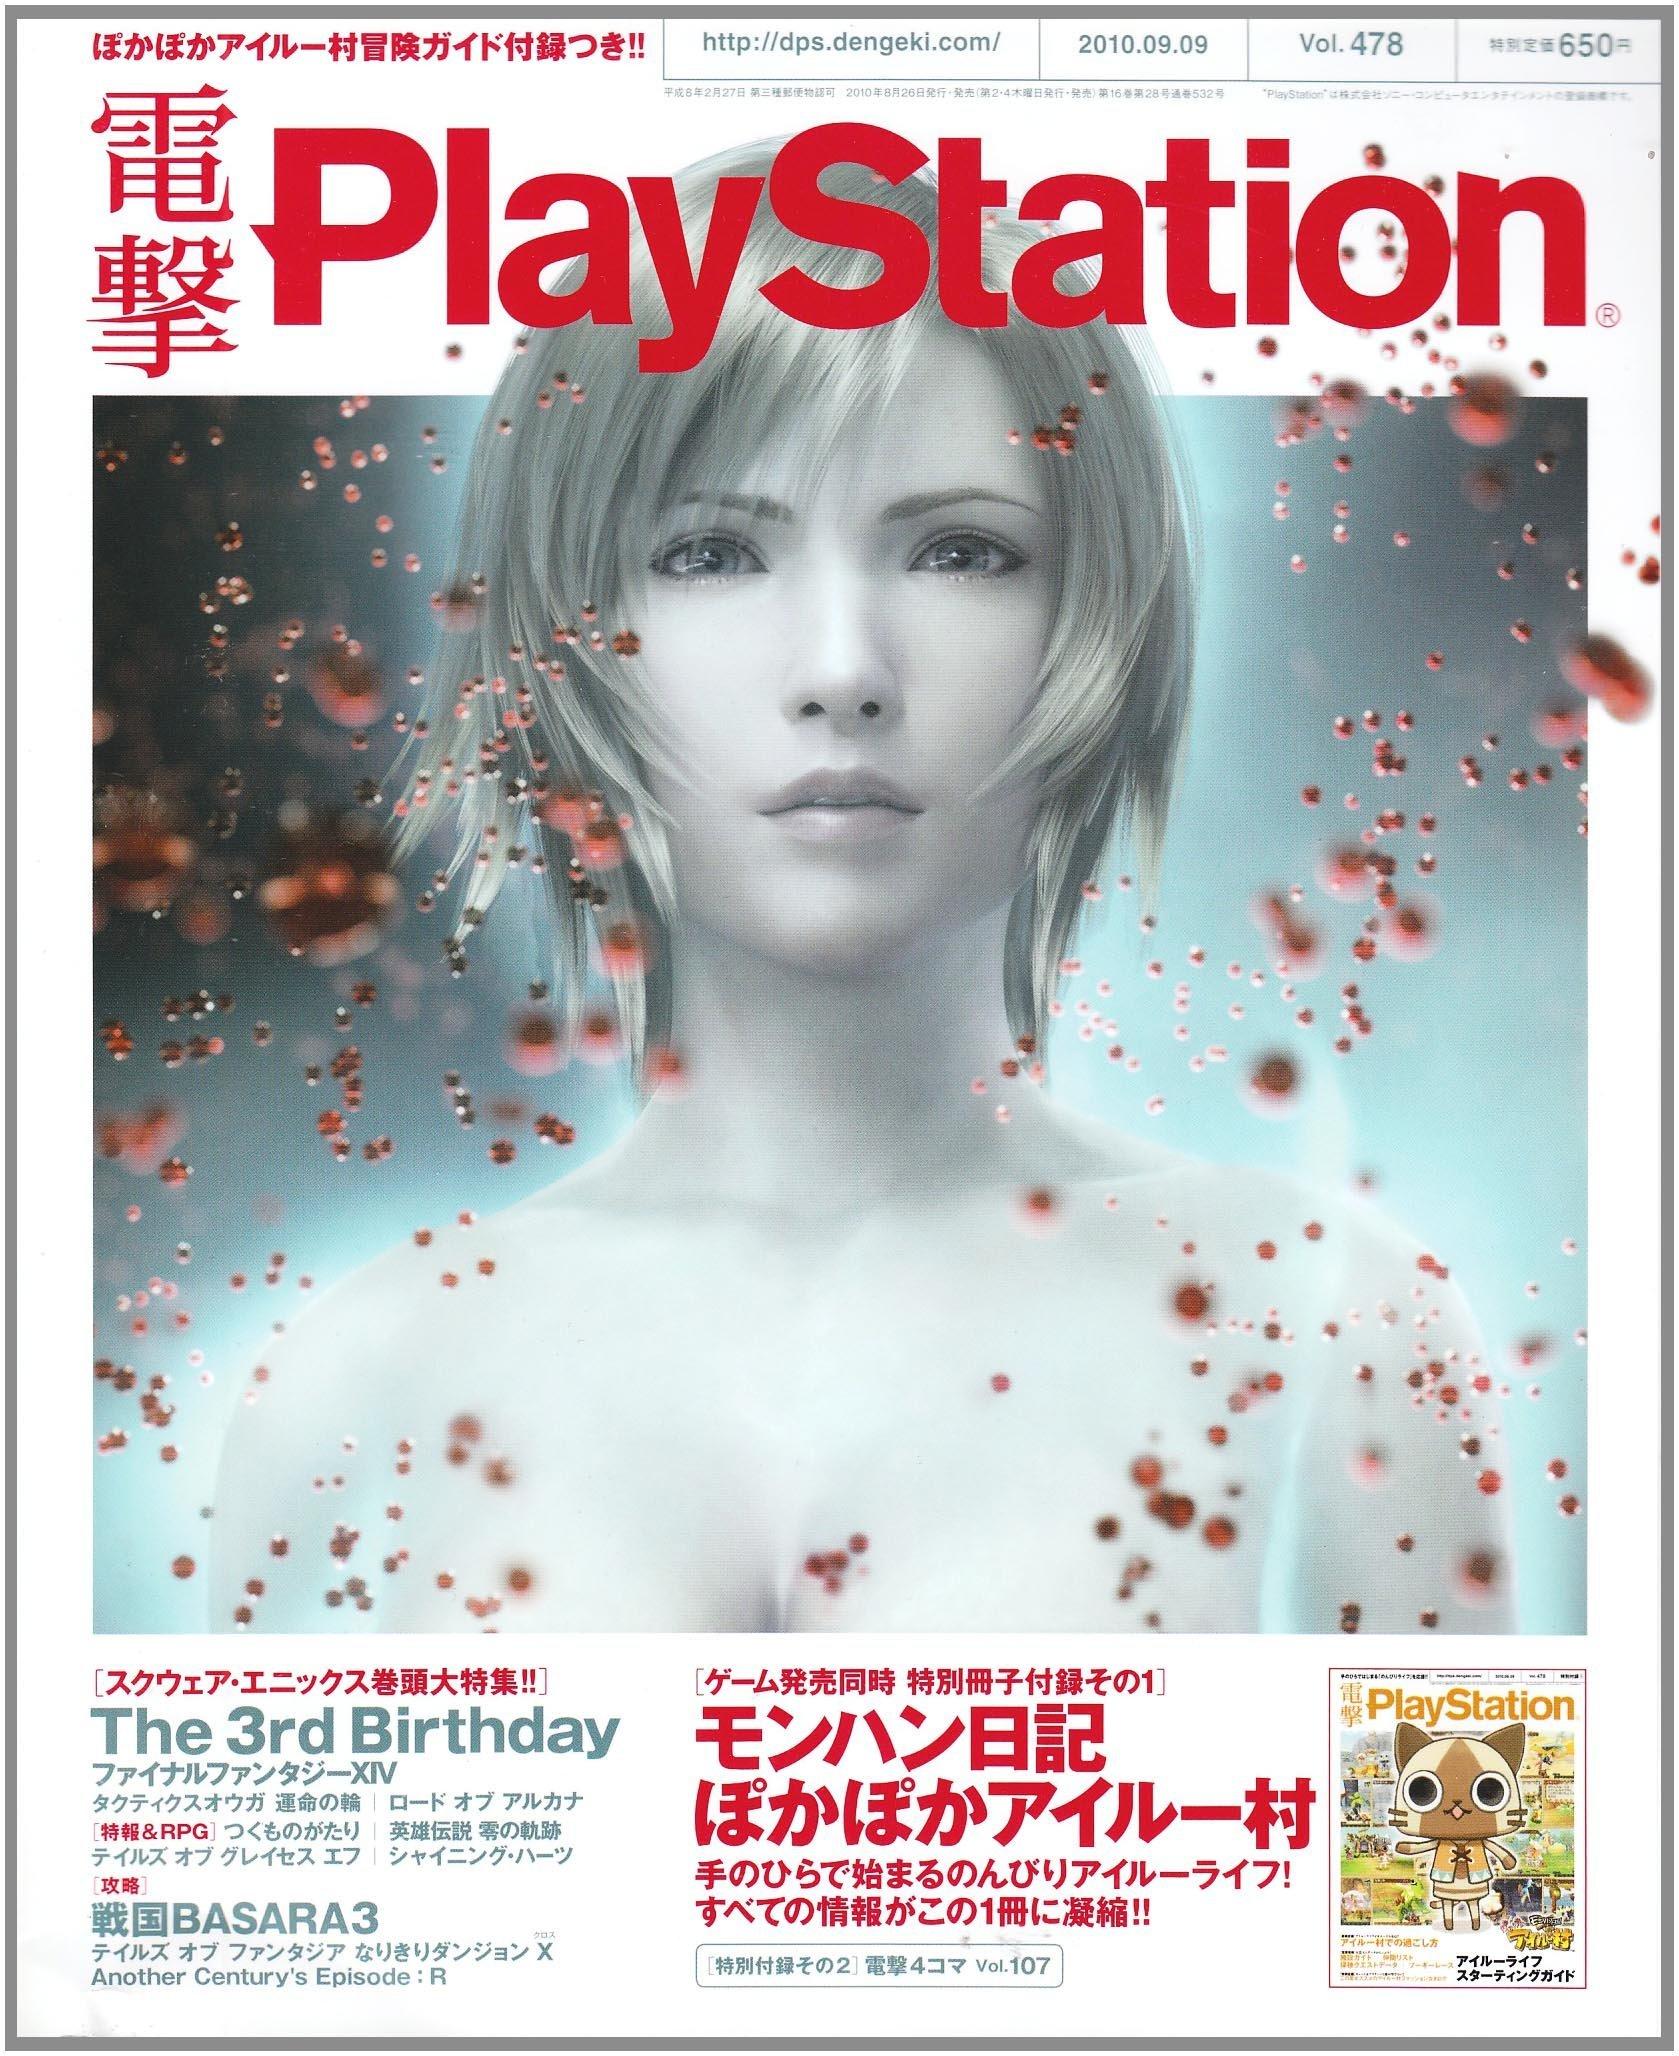 Dengeki PlayStation 478 (September 9, 2010)